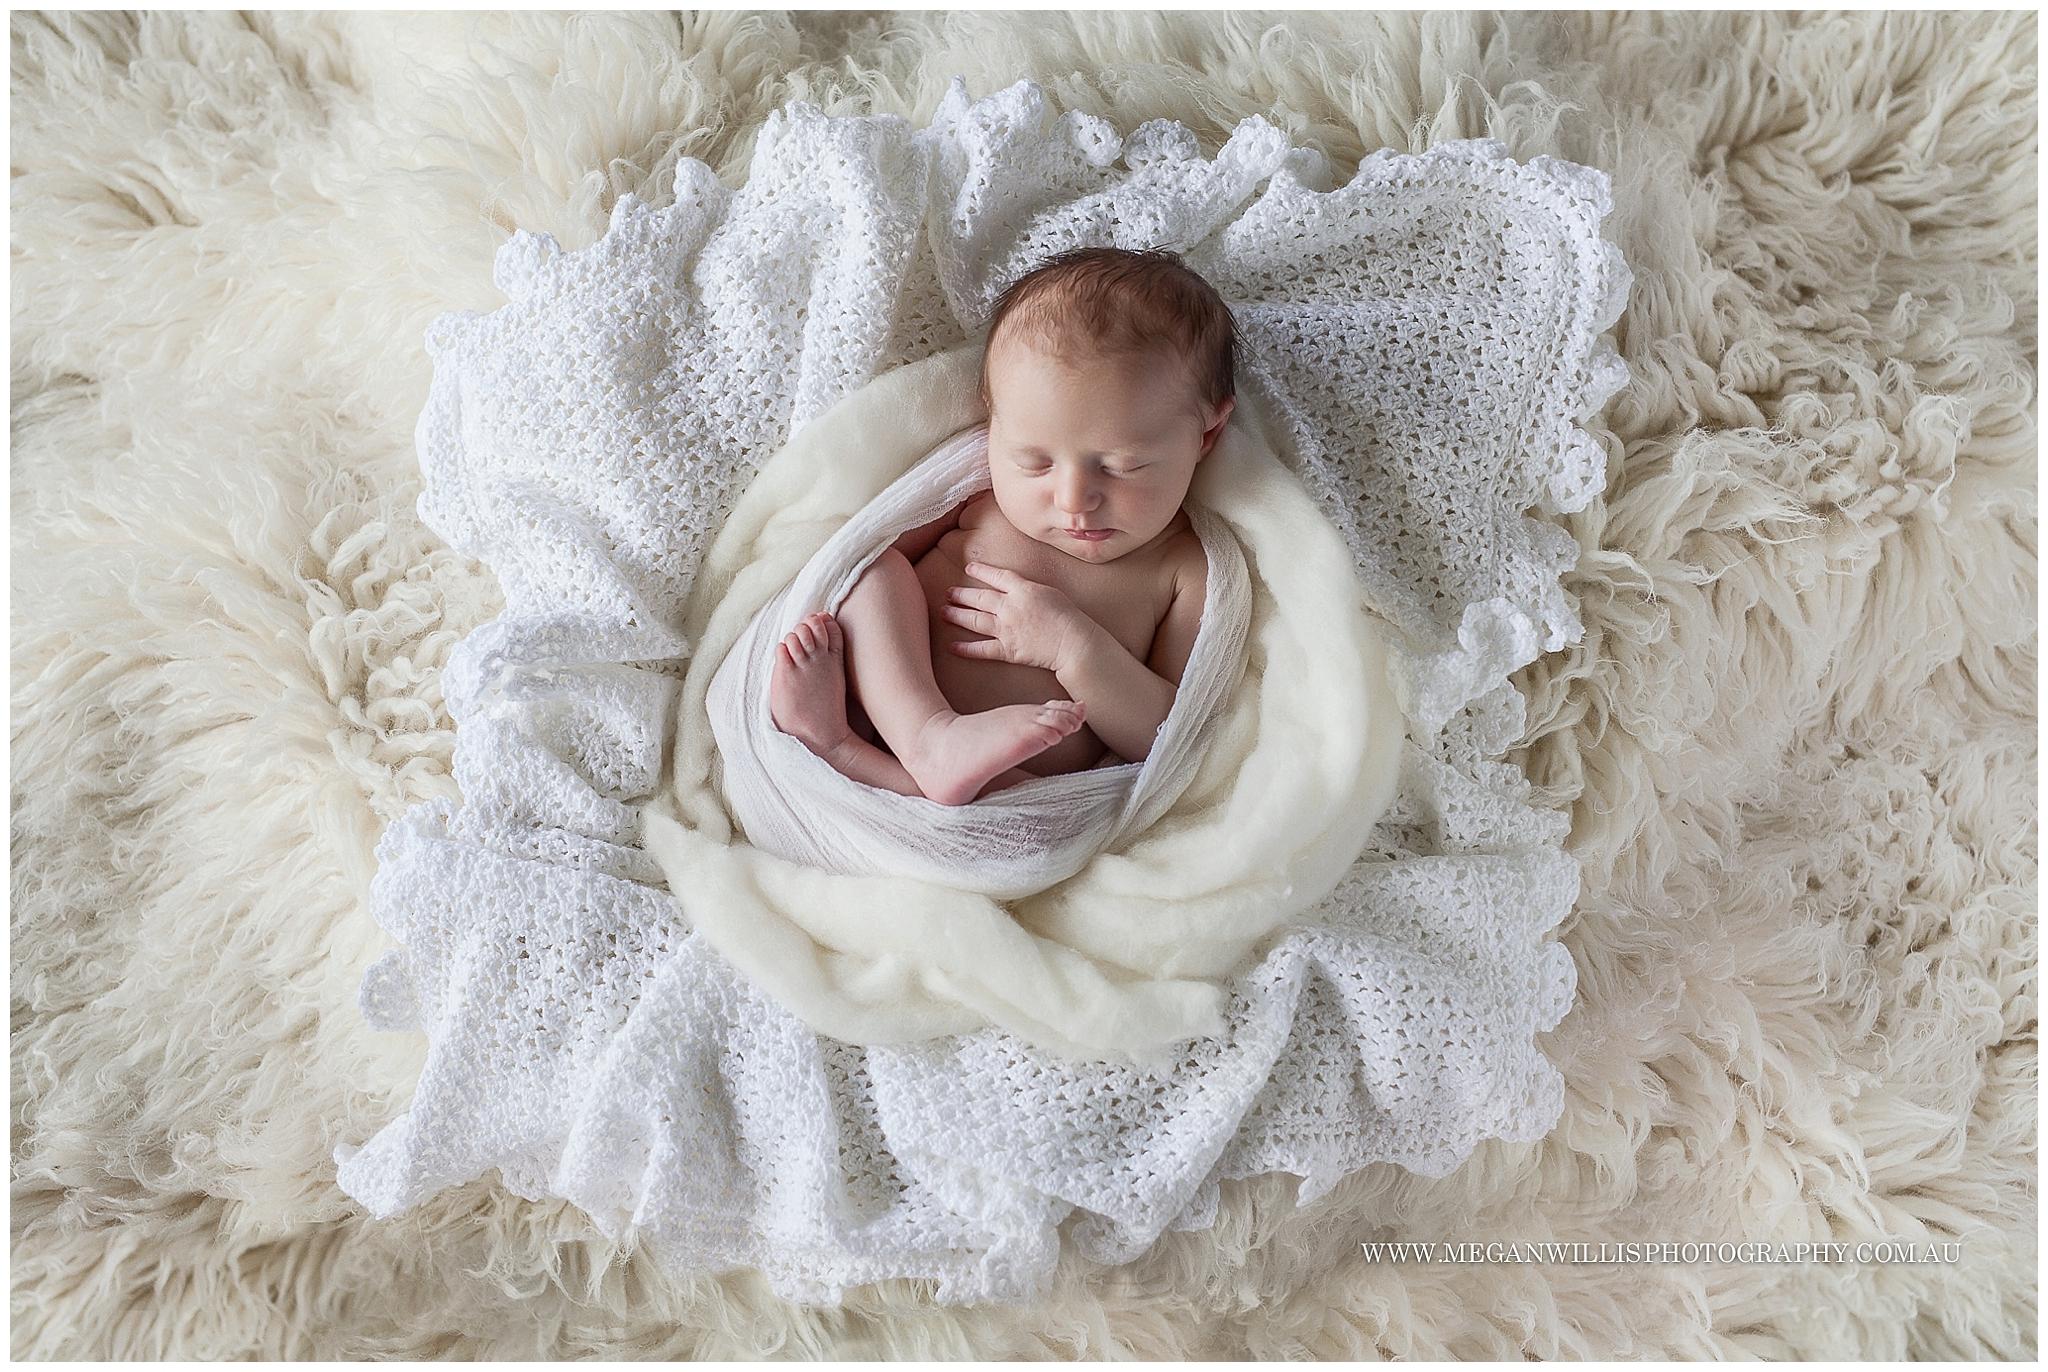 Scarlett // Toowoomba Newborn // December 2015